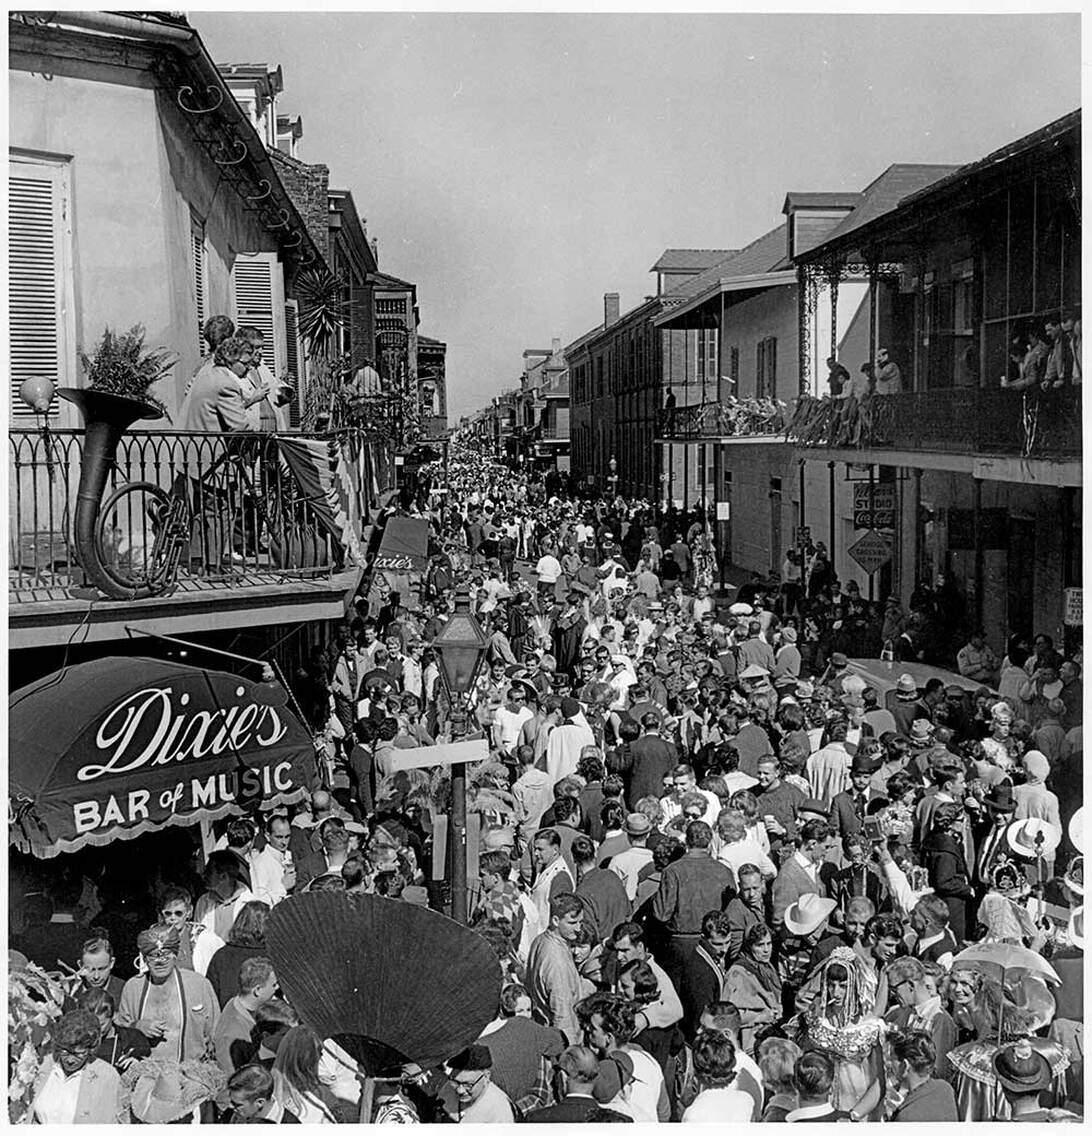 Dixie's Mardi Gras